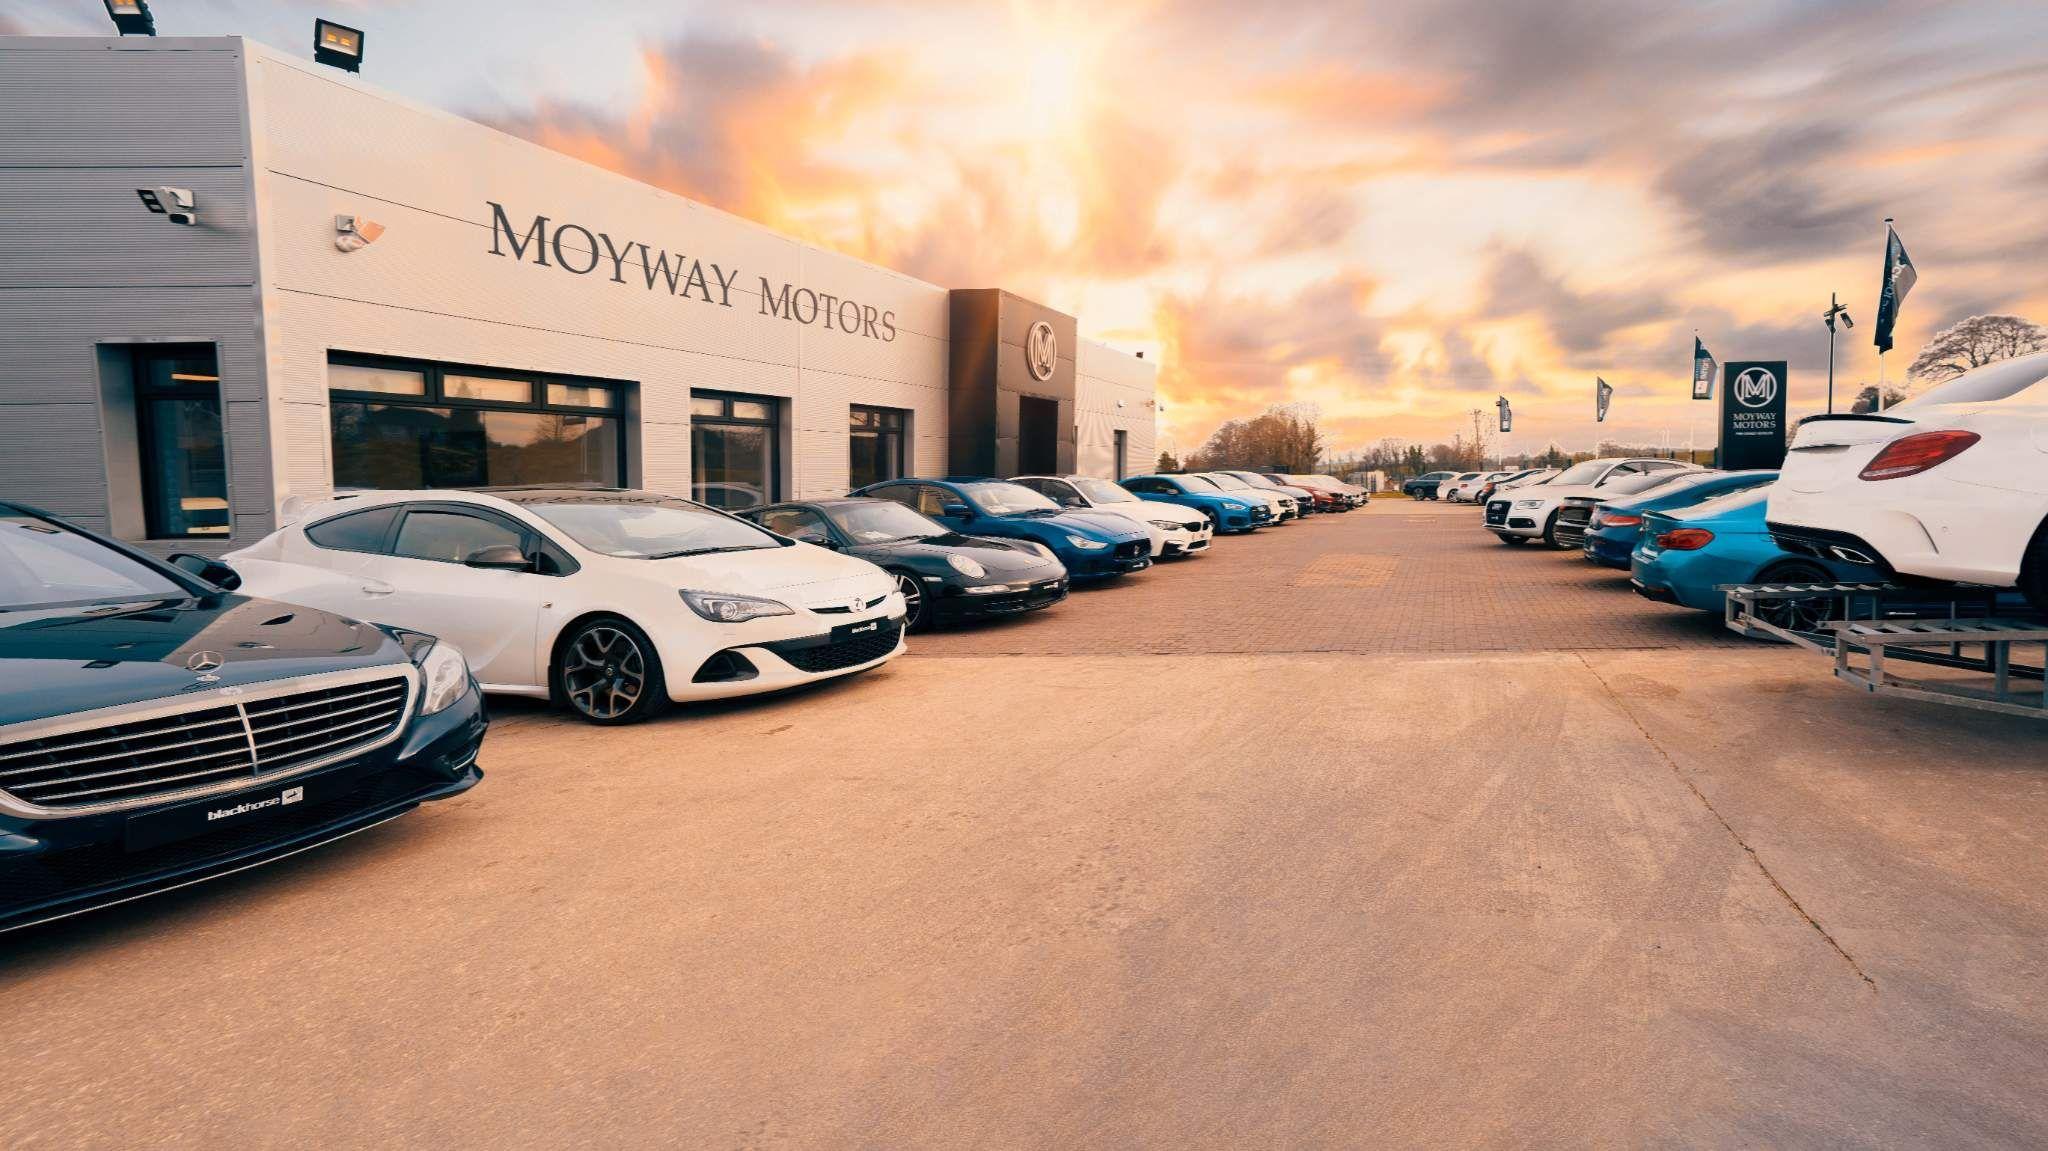 2017 BMW 4 Series Gran Coupe 2.0 420d M Sport Gran Coupe Auto (s/s) 5dr Diesel Automatic – Moyway Motors Dungannon full